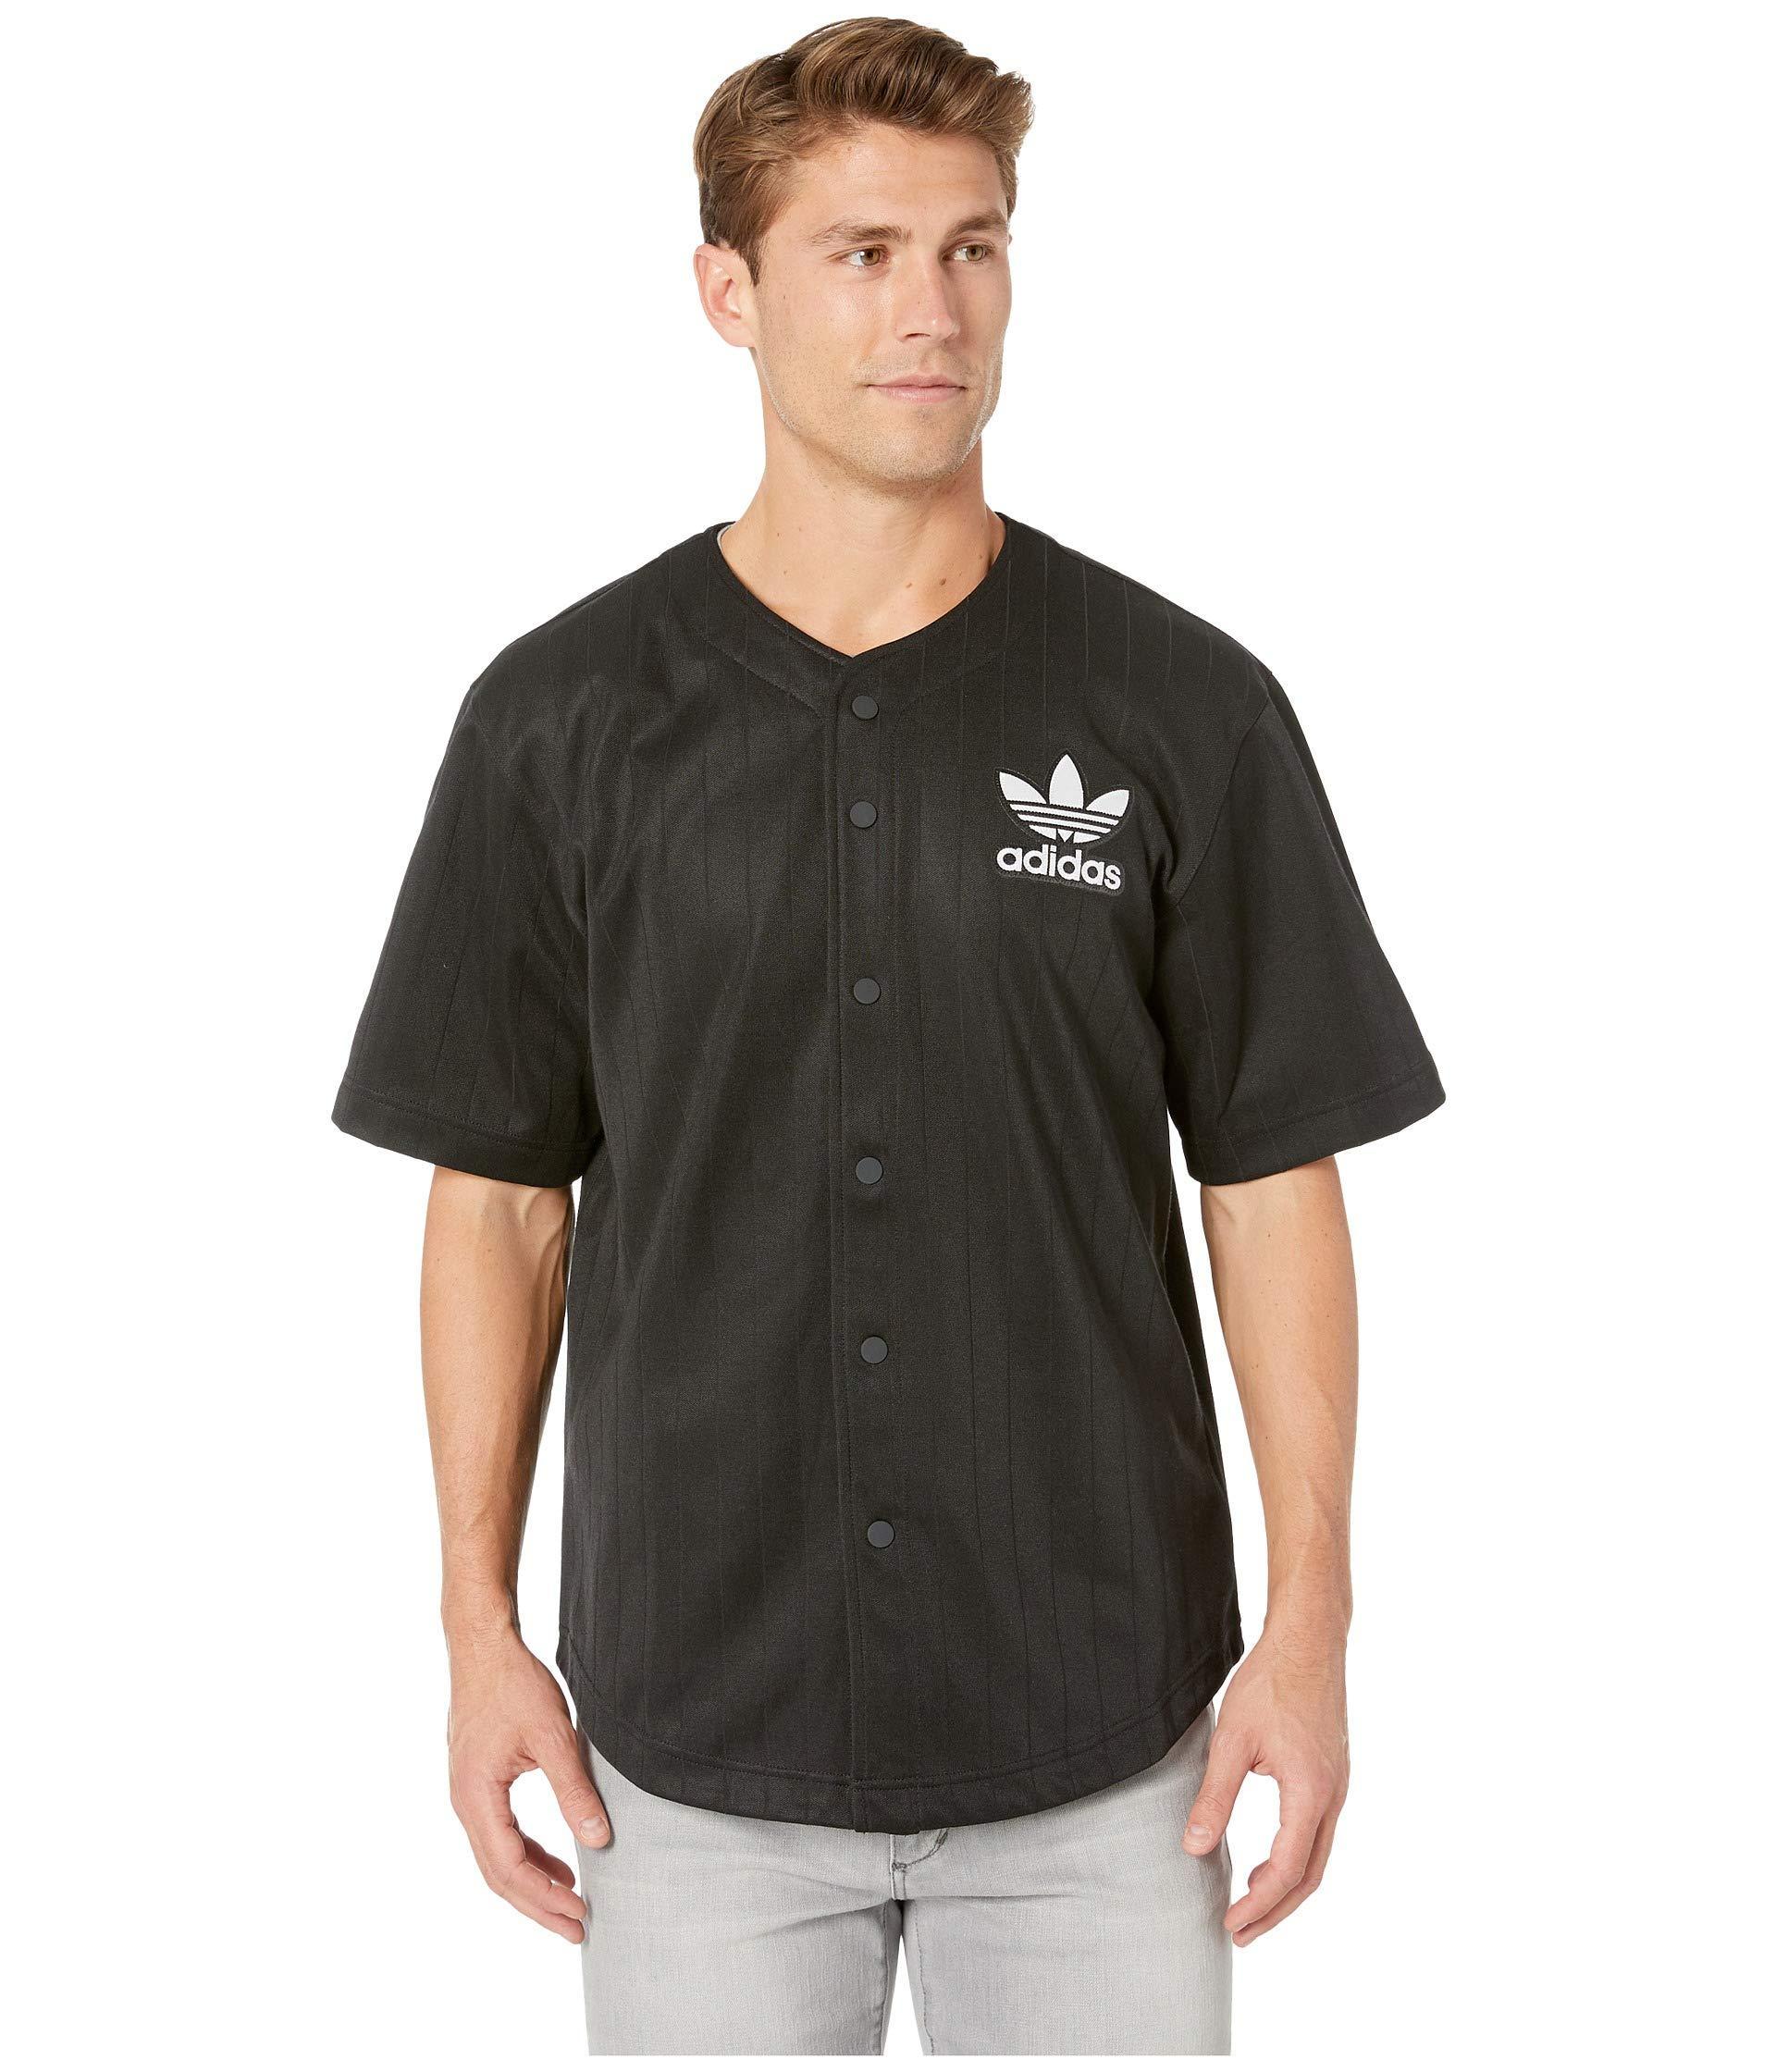 adidas Originals Satin Baseball Jersey (black/white) Men's Short ...